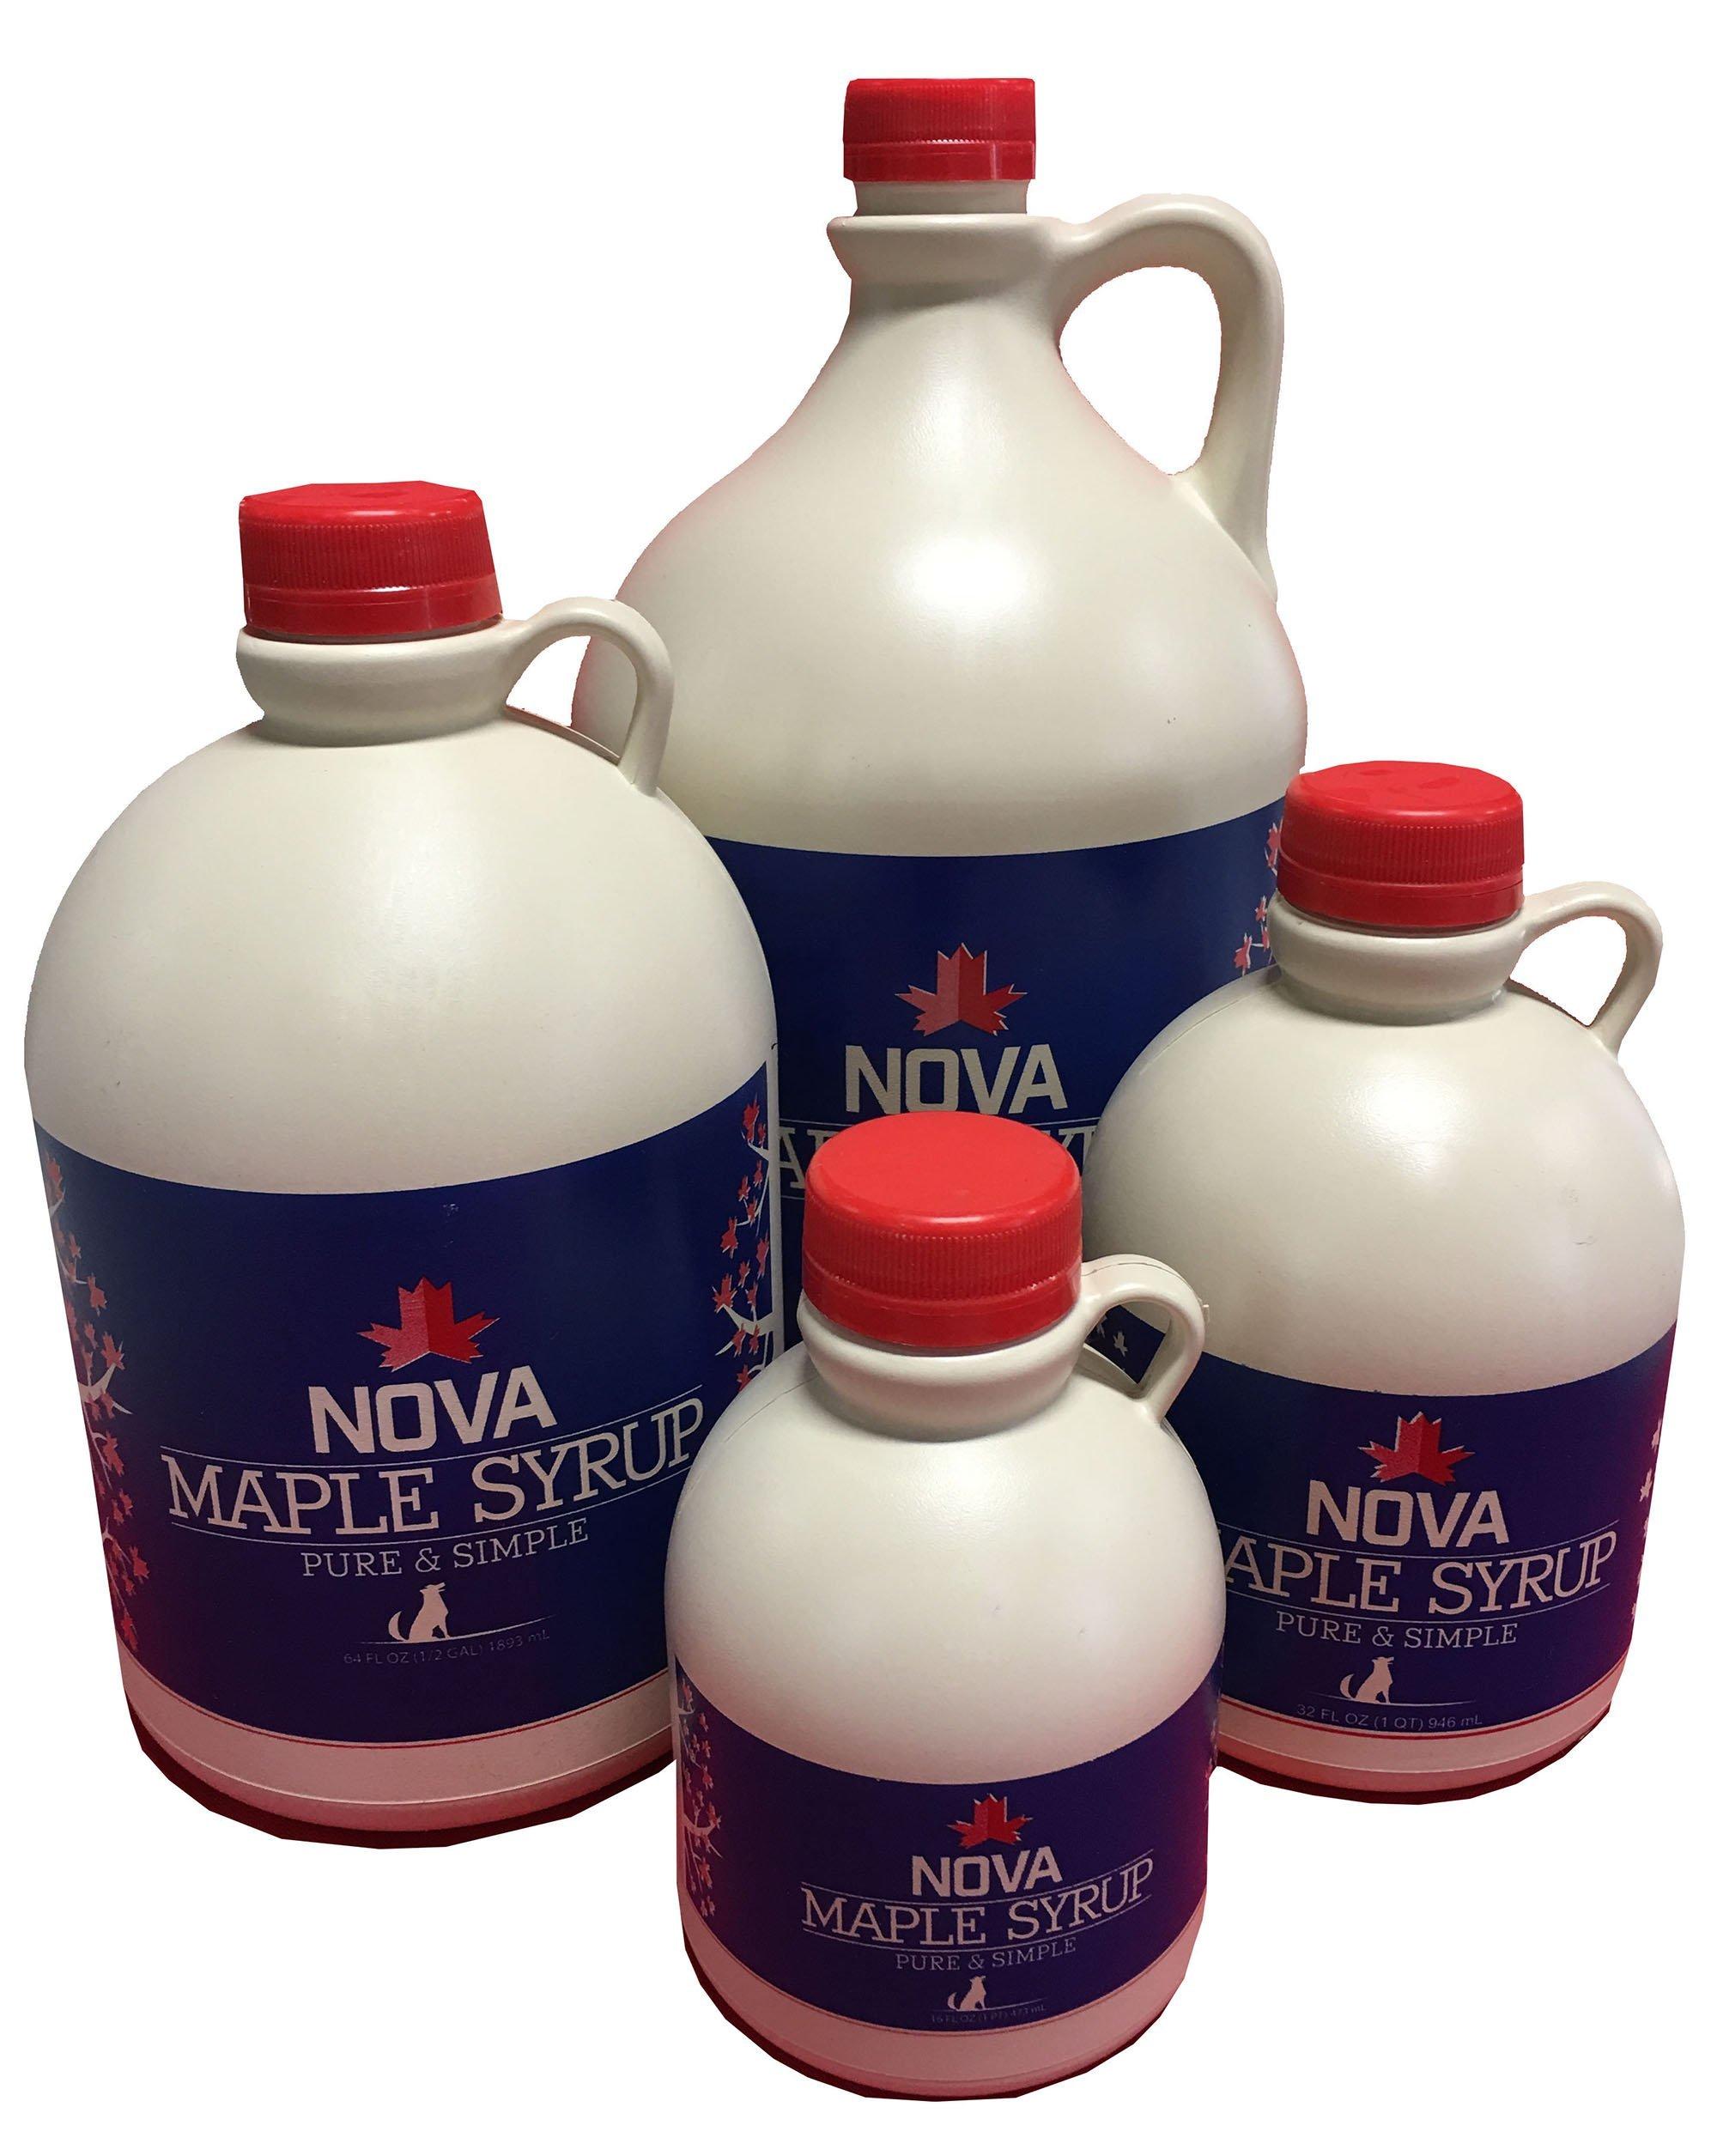 Nova Maple Syrup - Pure Grade-A Maple Syrup (Gallon) by Nova Maple Syrup (Image #2)